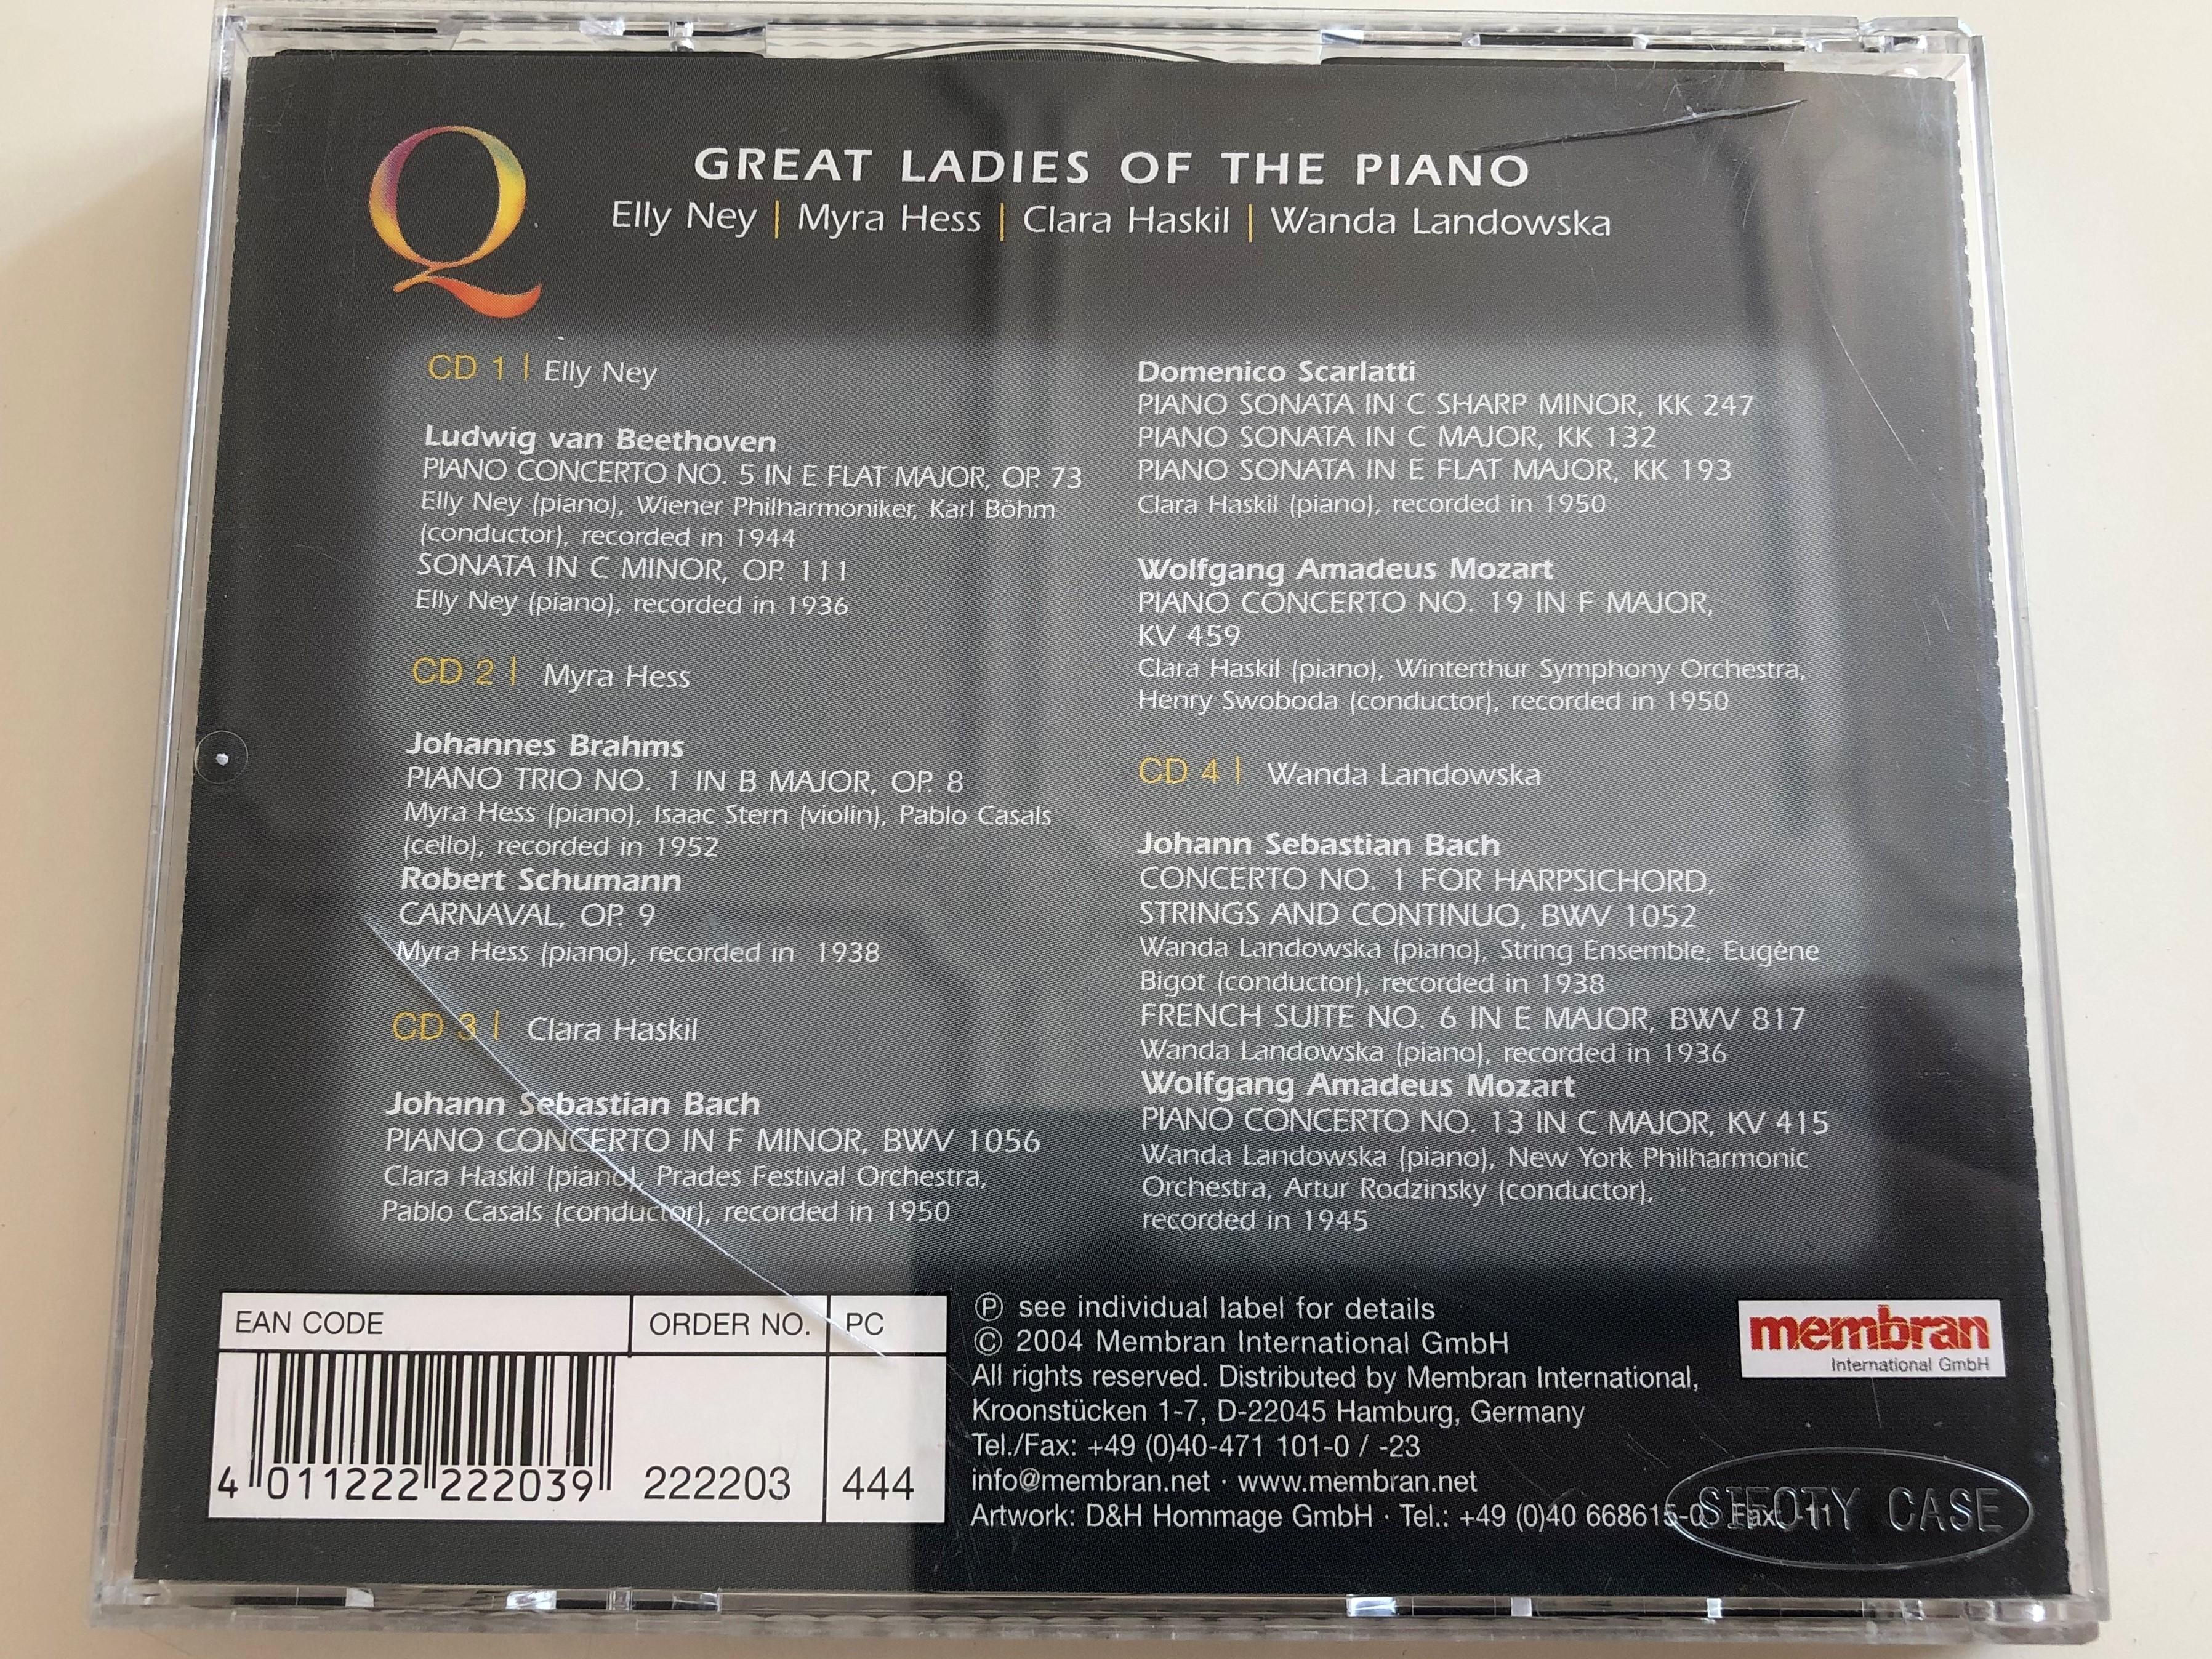 quadromania-great-ladies-of-the-piano-elly-ney-myra-hess-clara-haskil-wanda-landowska-beethoven-brahms-bach-scarlatti-mozart-4-cd-set-membran-7-.jpg